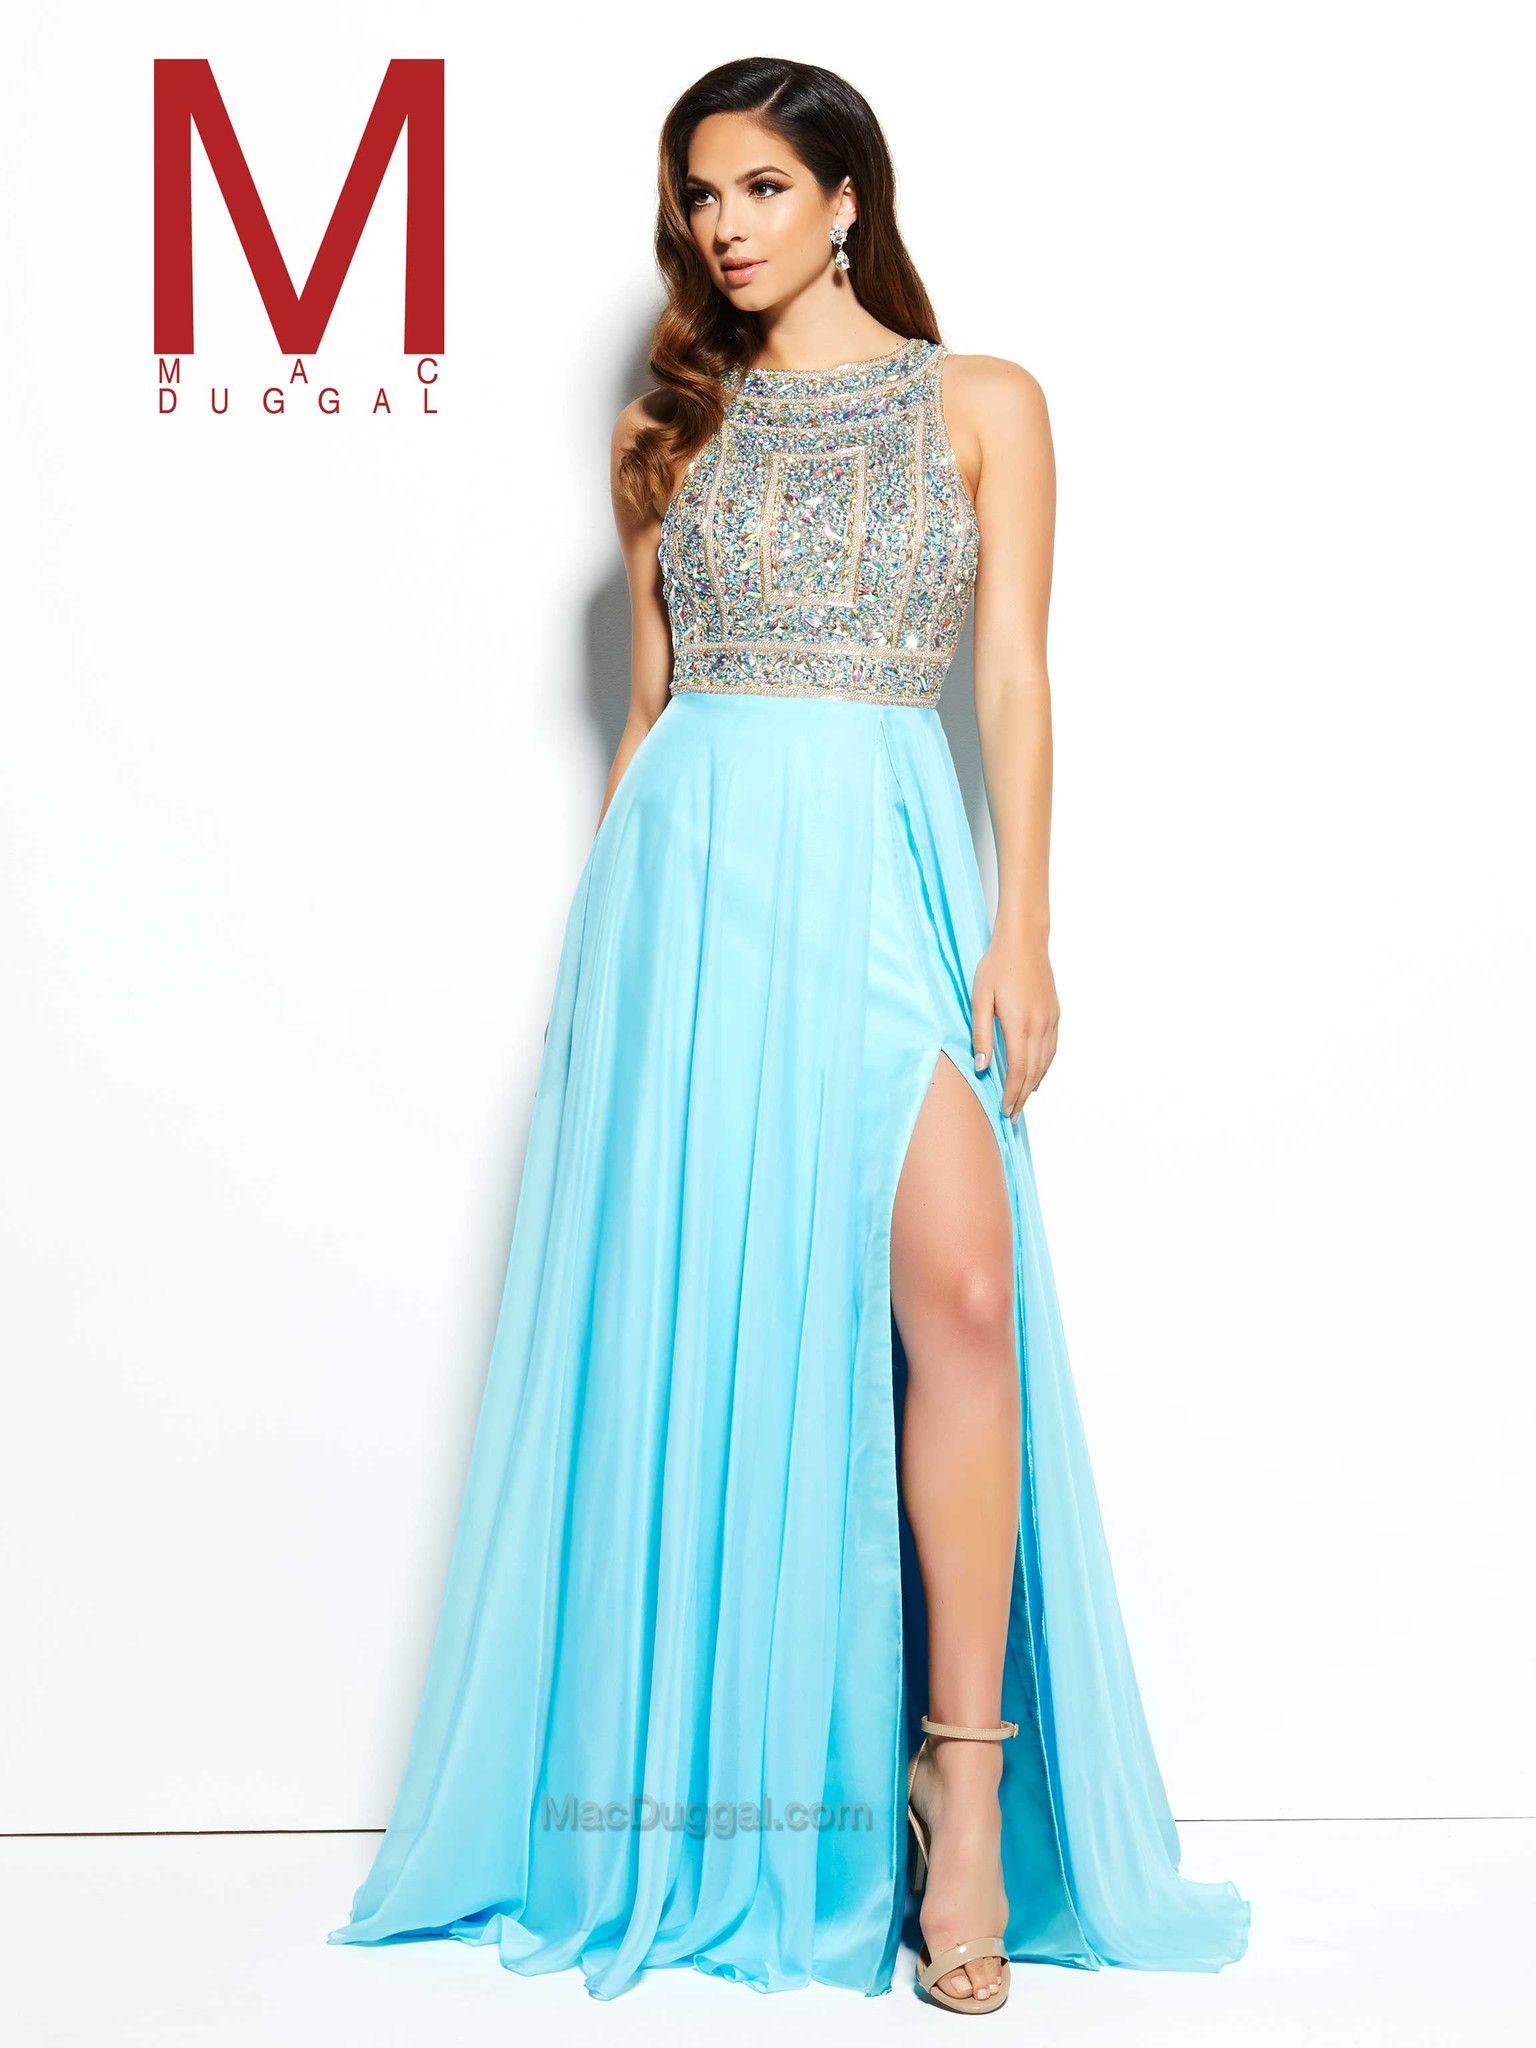 Cassandra Stone by Mac Duggal 40403A | Great Dresses | Pinterest ...